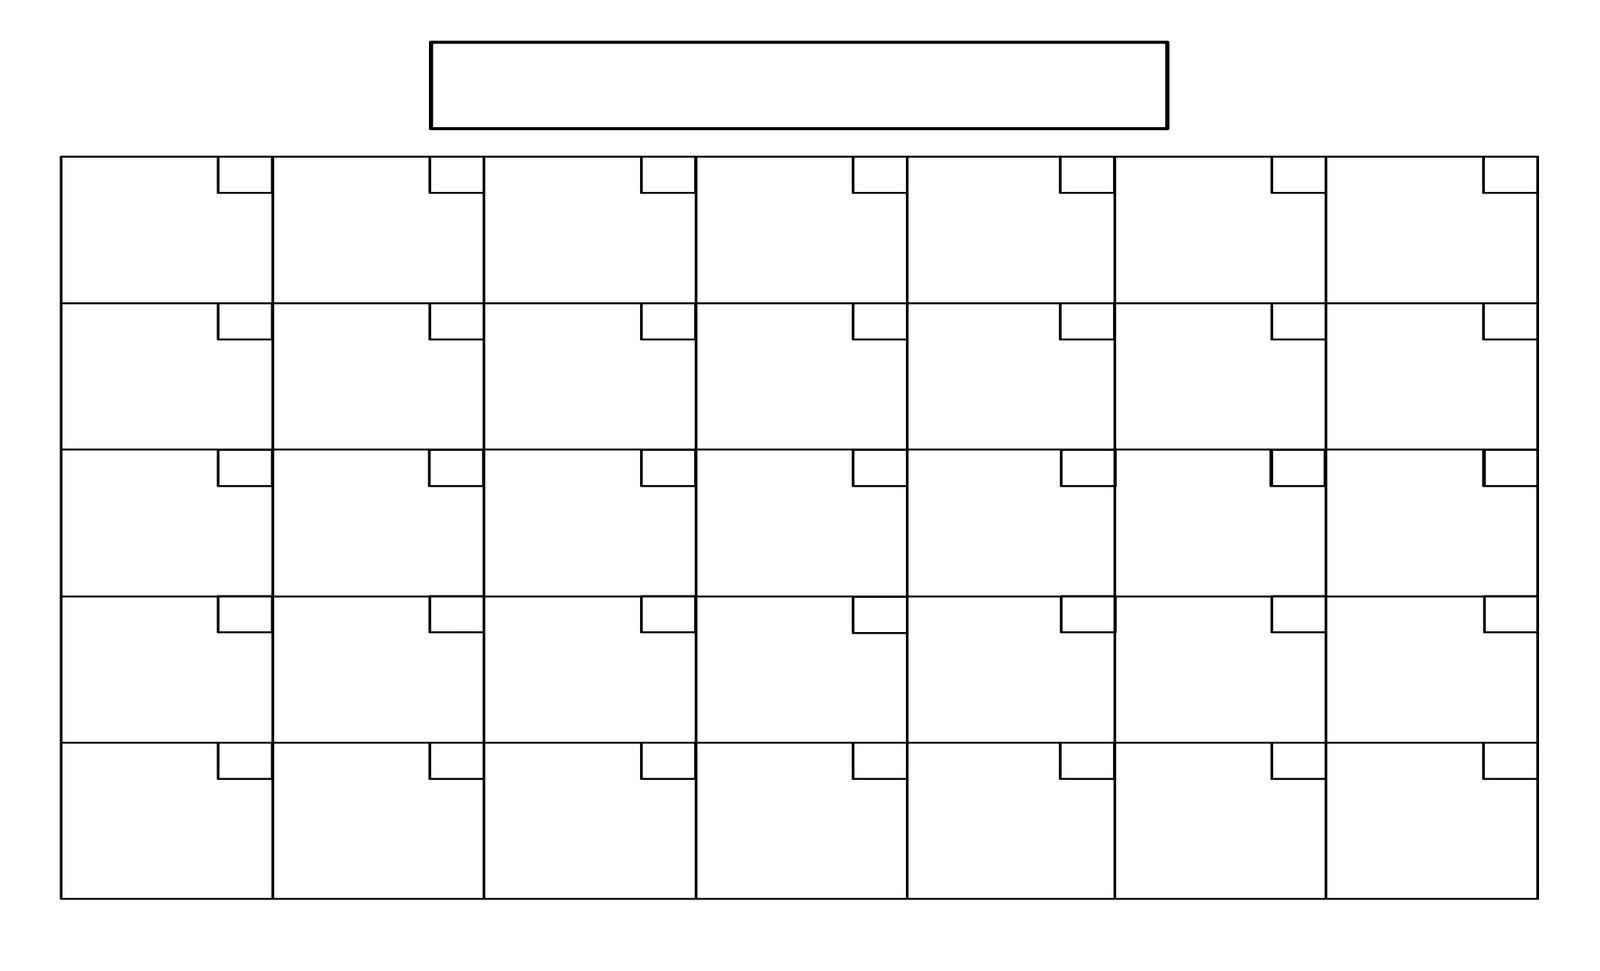 printable full page blank calendar template | blank calendar